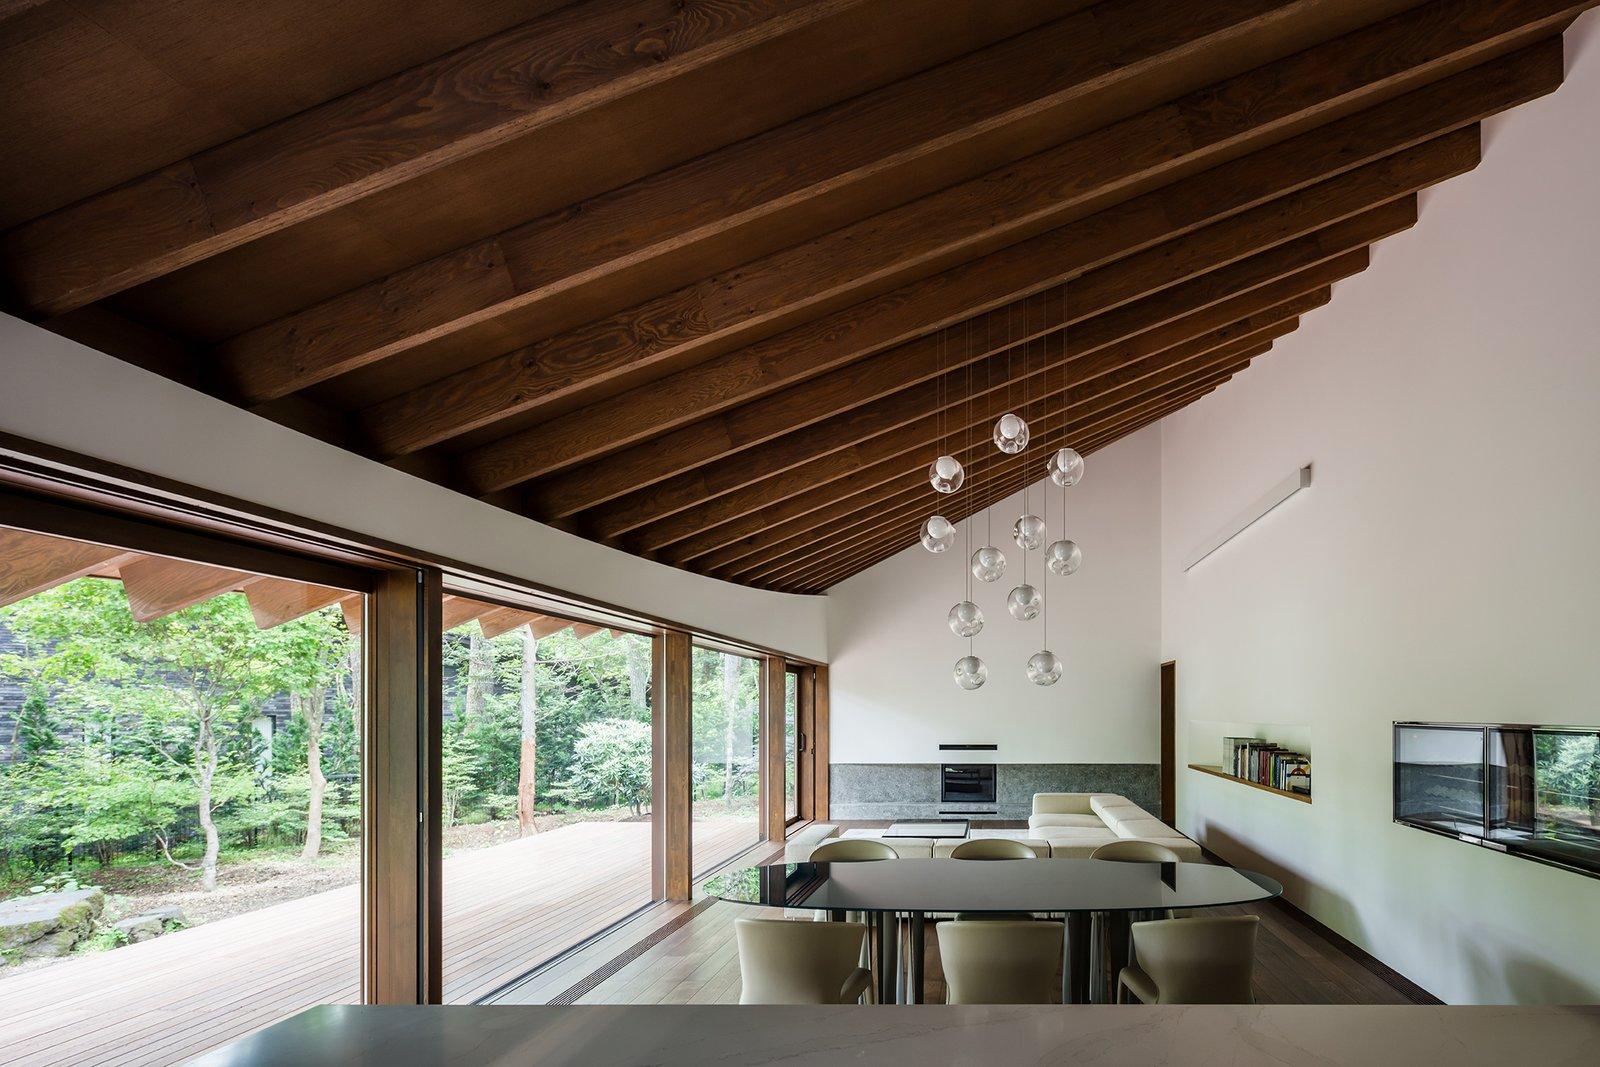 Four Leaves exposed wood ceiling beams